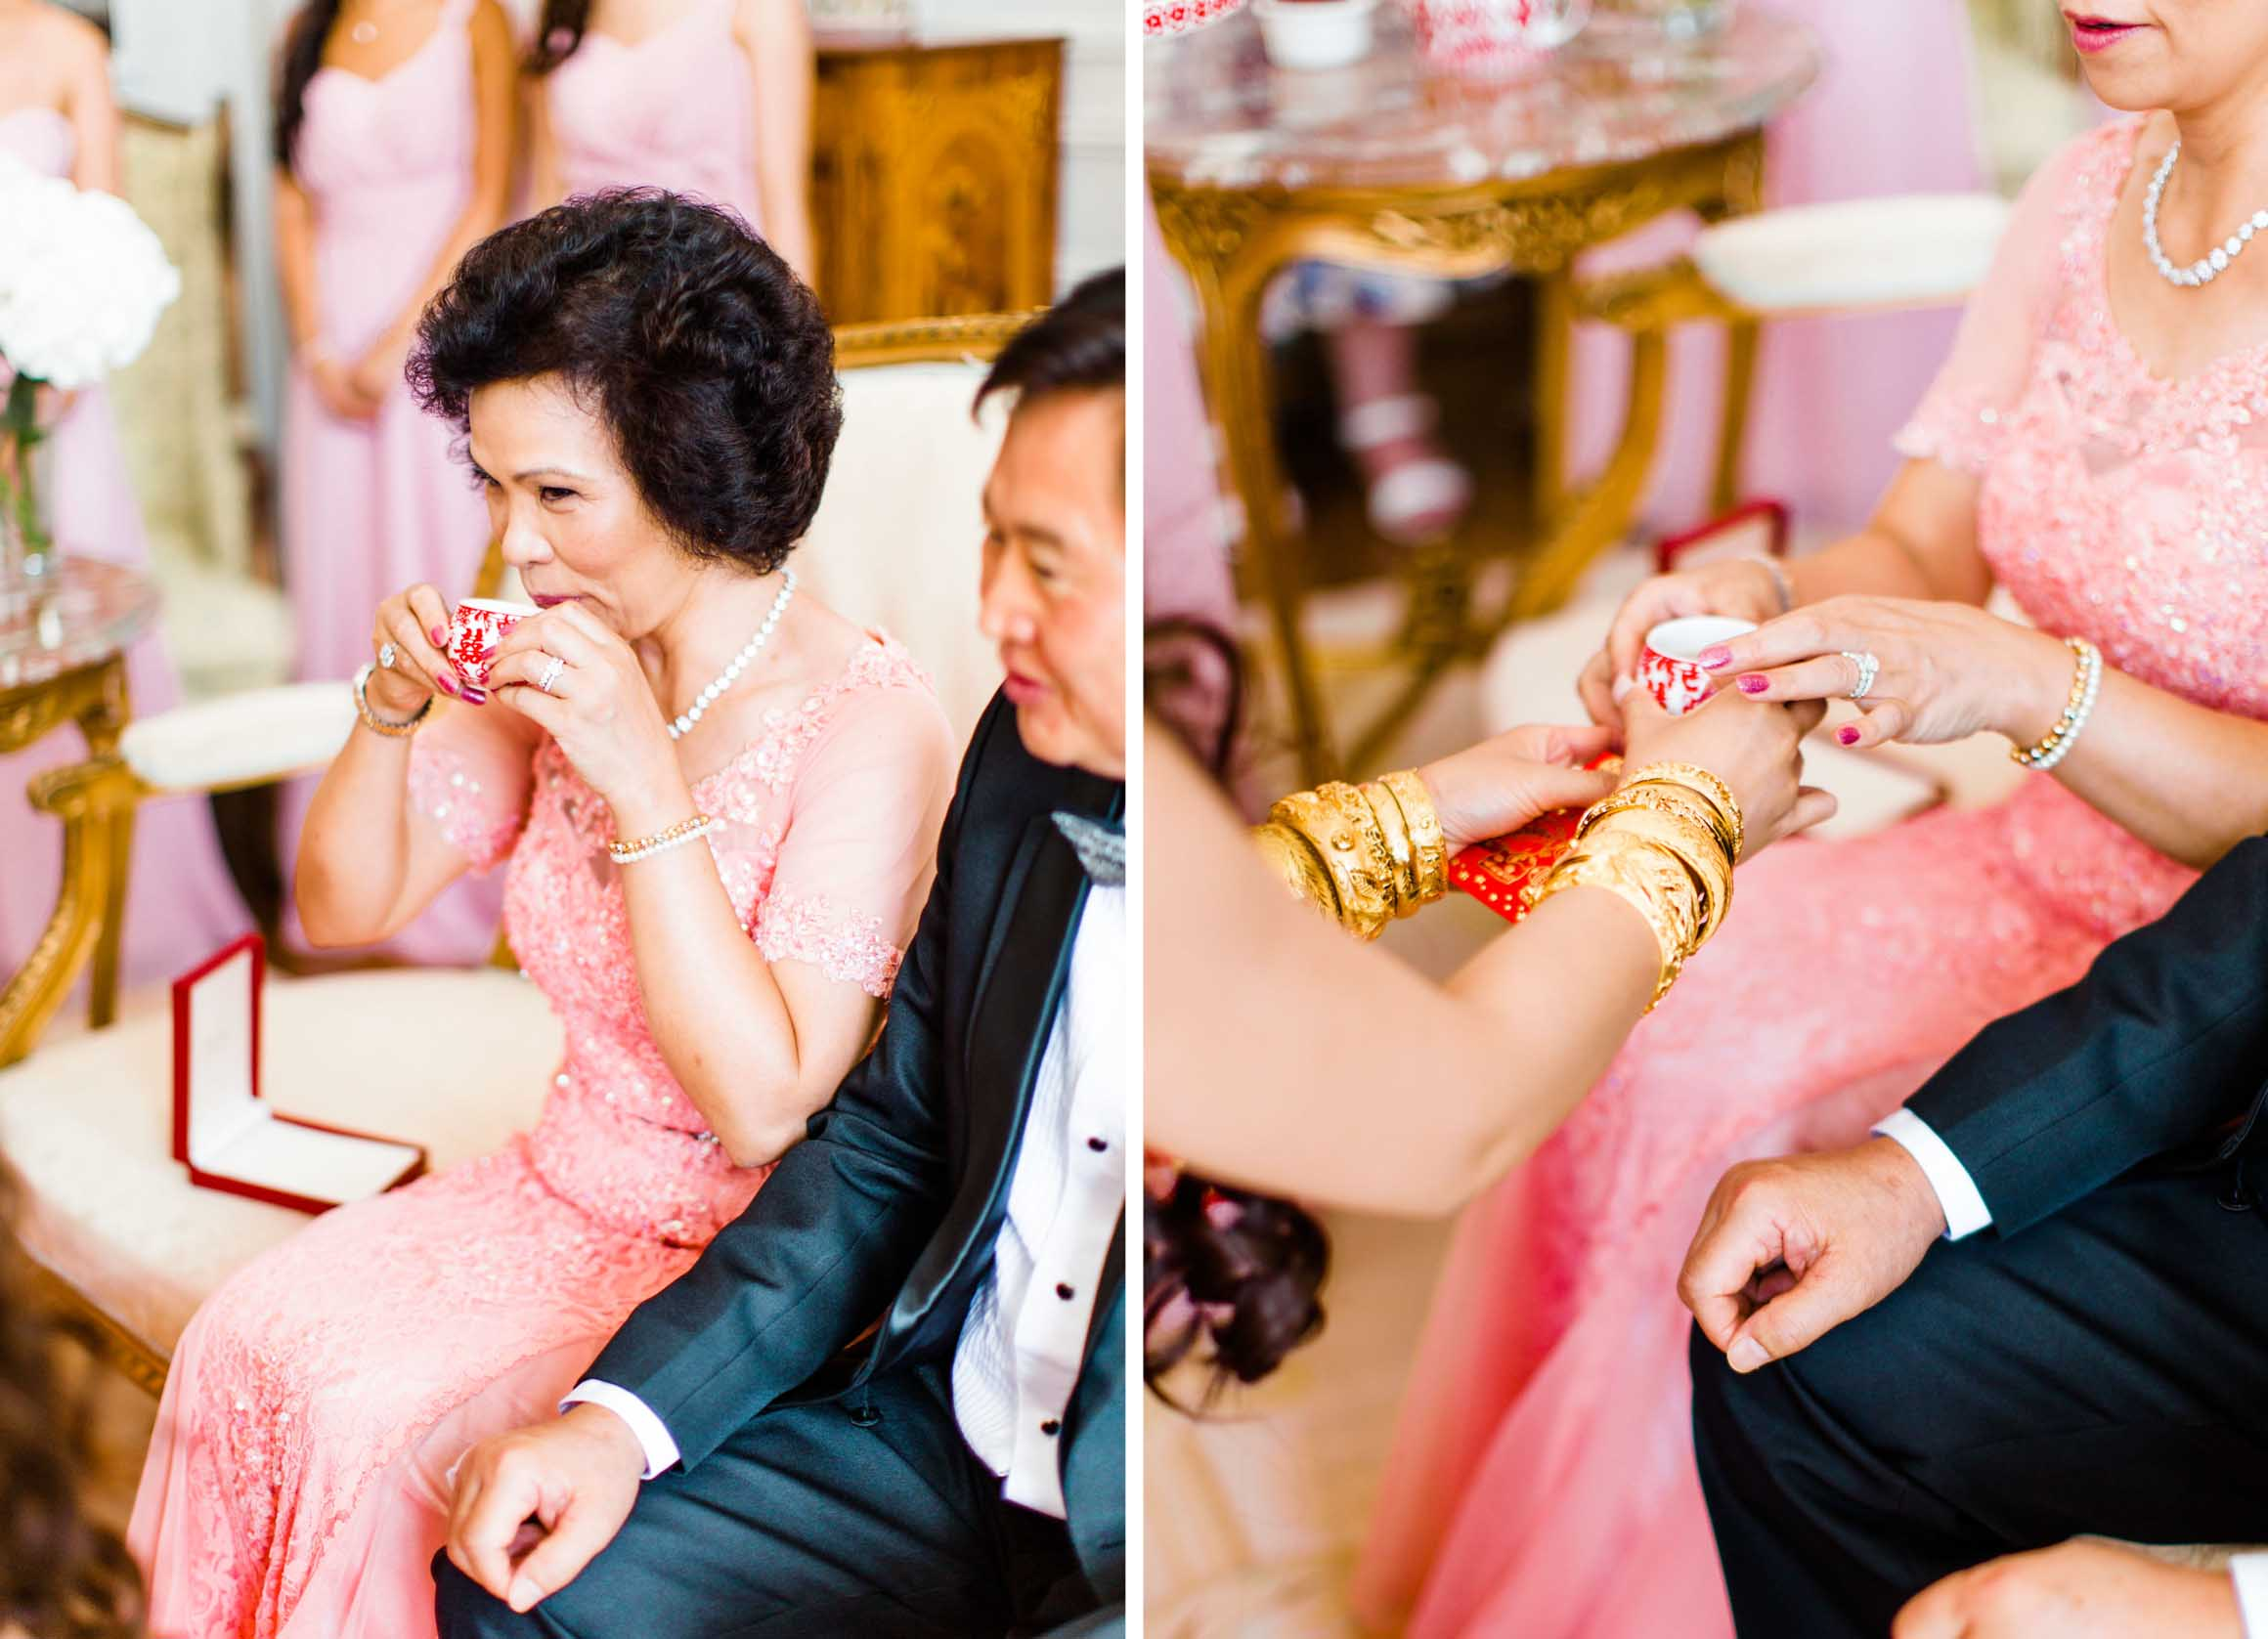 Amy O'Boyle Photography- Destination & UK Fine Art Film Wedding Photographer- Chateau La Durantie Wedding 21.jpg